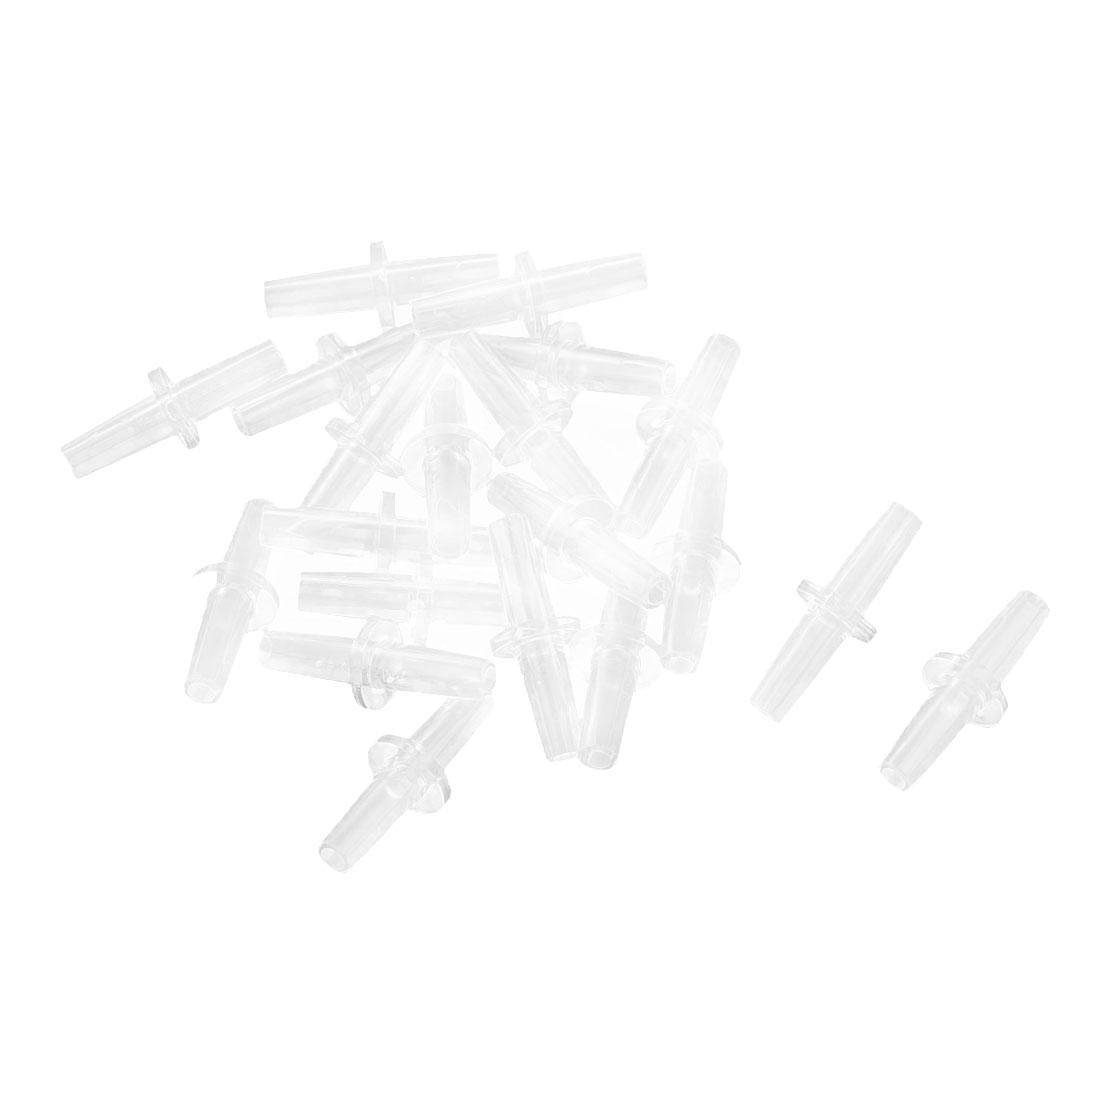 20 Pcs Clear Plastic 2 Way Aquarium Oxygen Pipe Air Airline Tube Pump Valve Connector Tubing